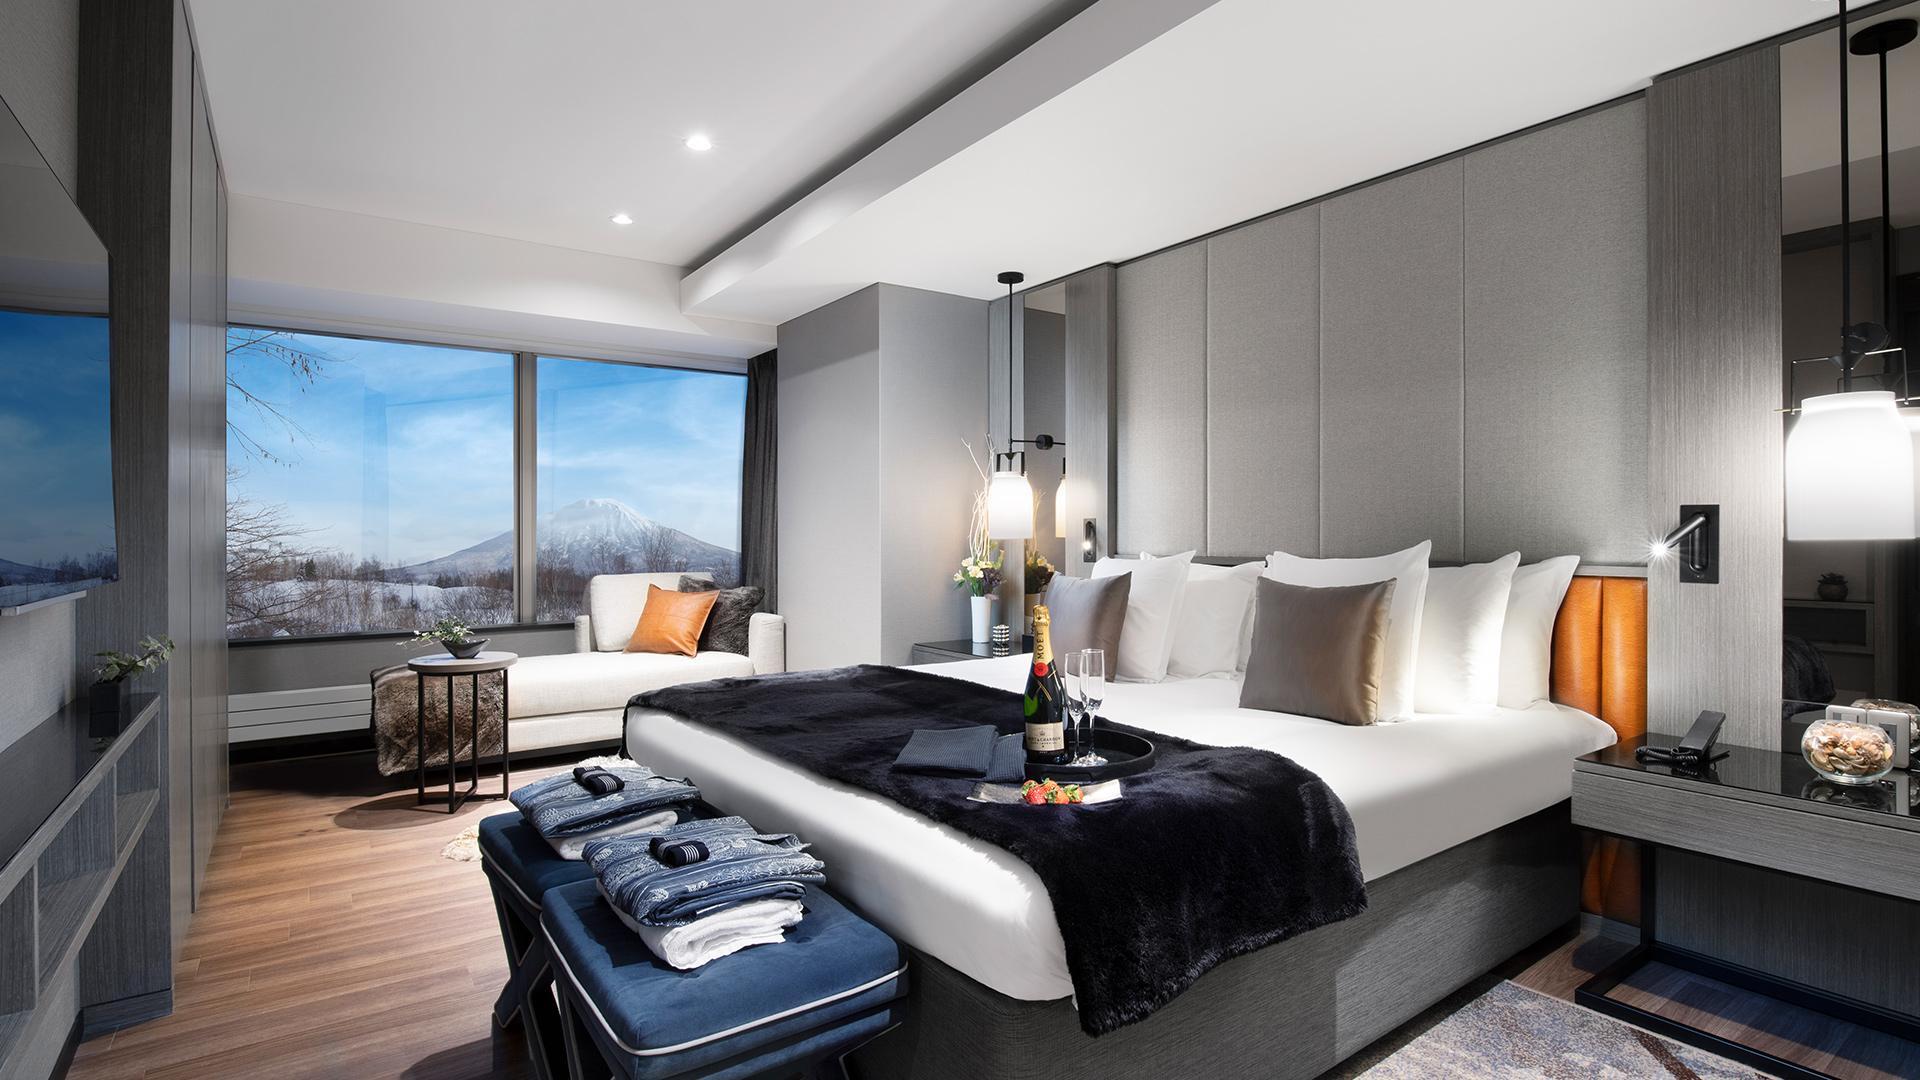 Two-Bedroom Suite (2020) image 1 at Hinode Hills Niseko Village by Abuta-gun, Hokkaido, Japan